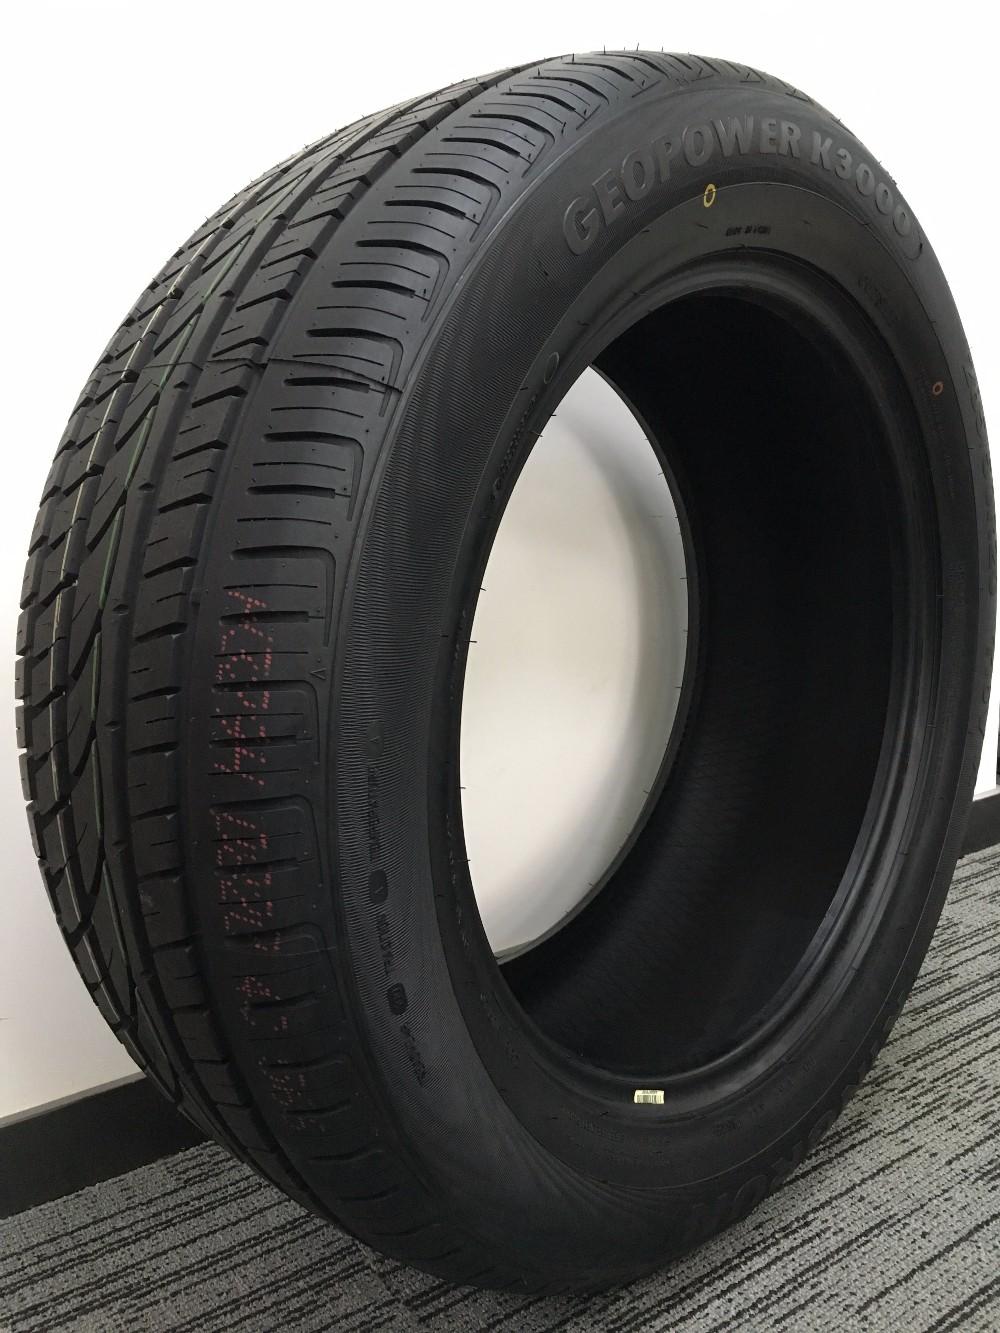 kingrun cheap wholesale tires 235 75r15 mud tires tire stud gun buy cheap wholesale tires 235. Black Bedroom Furniture Sets. Home Design Ideas